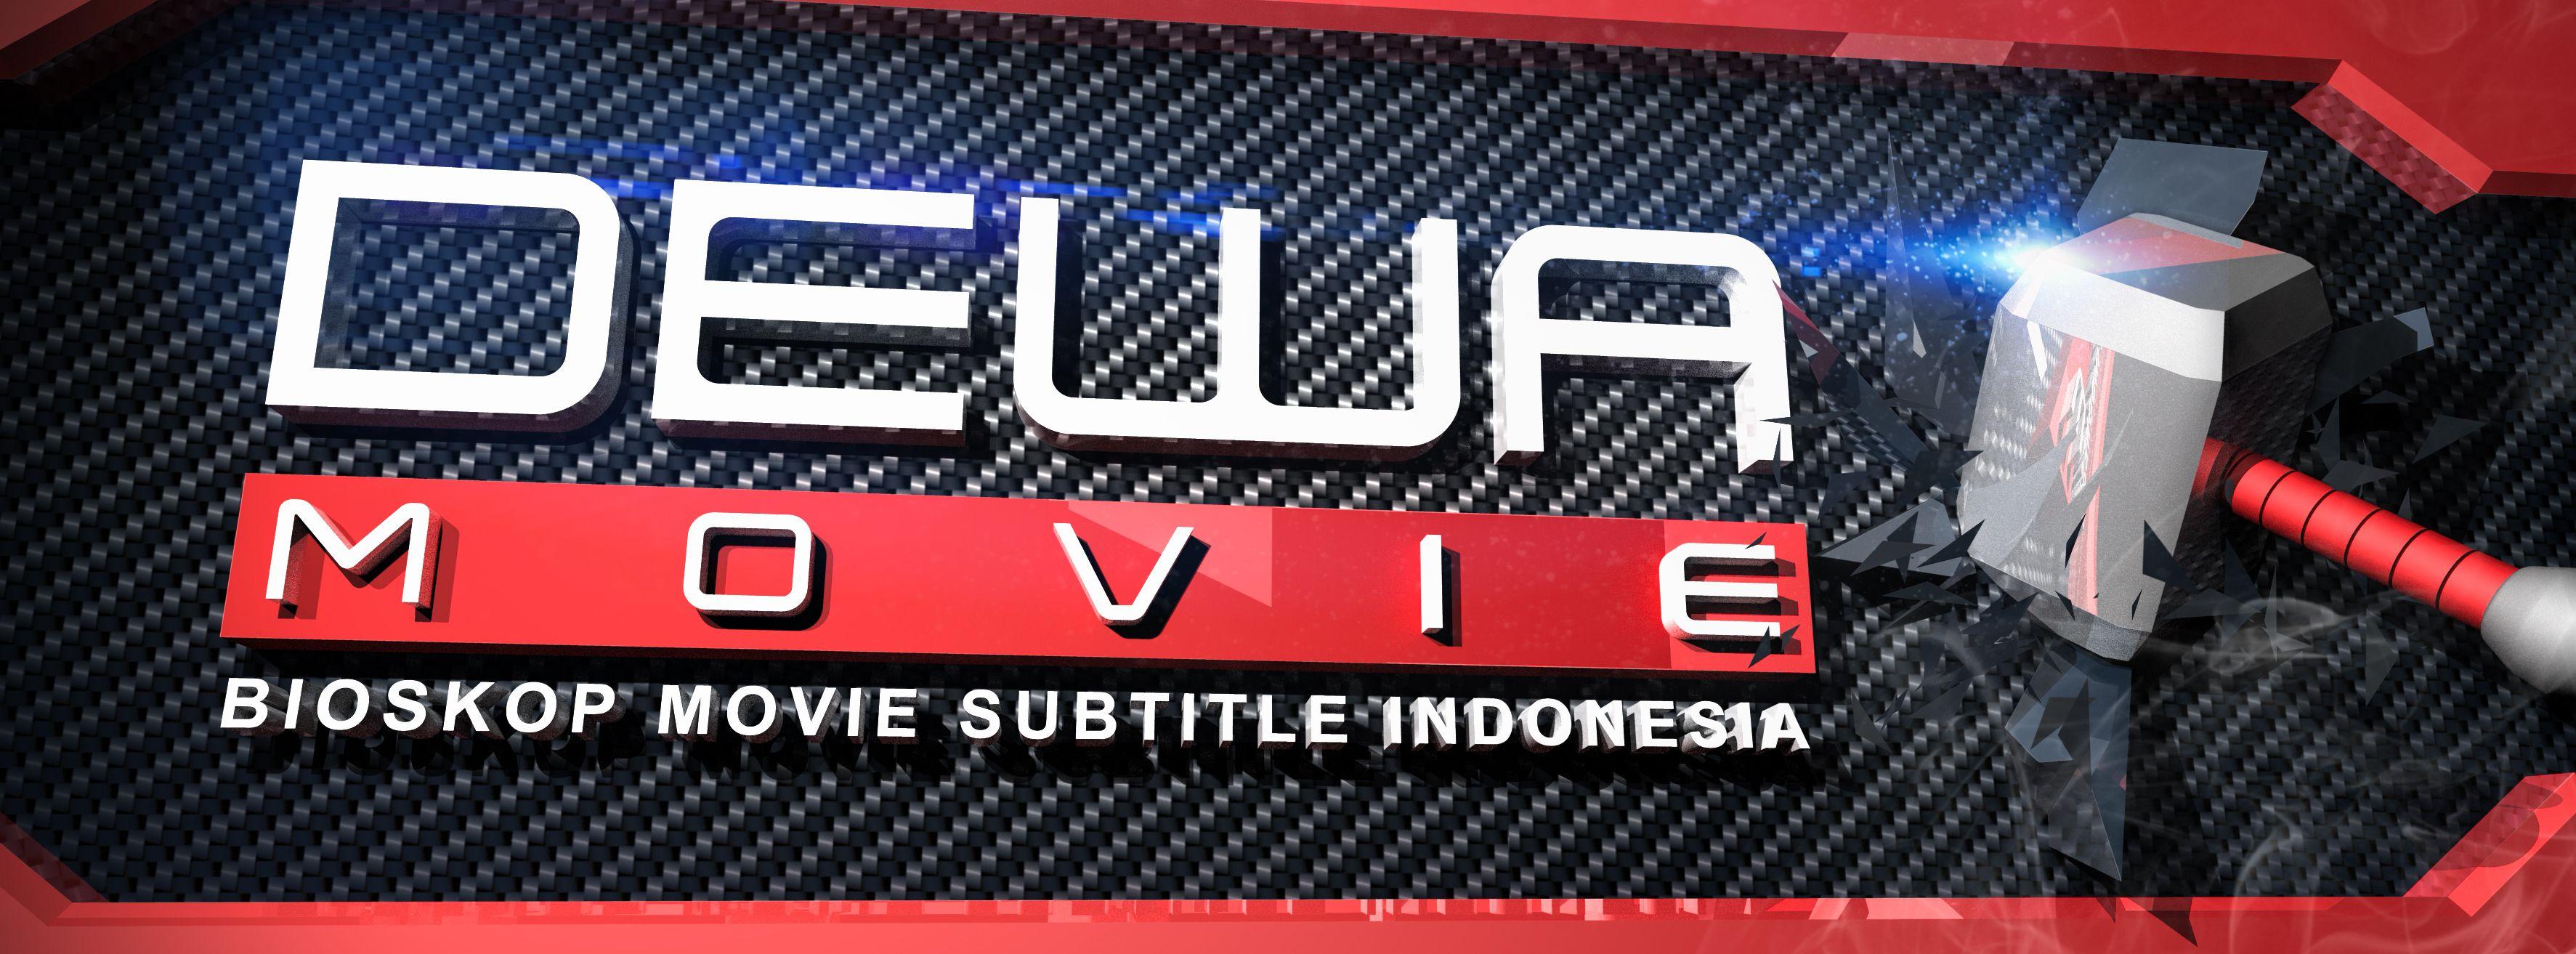 download film tangled ever after subtitle indonesia